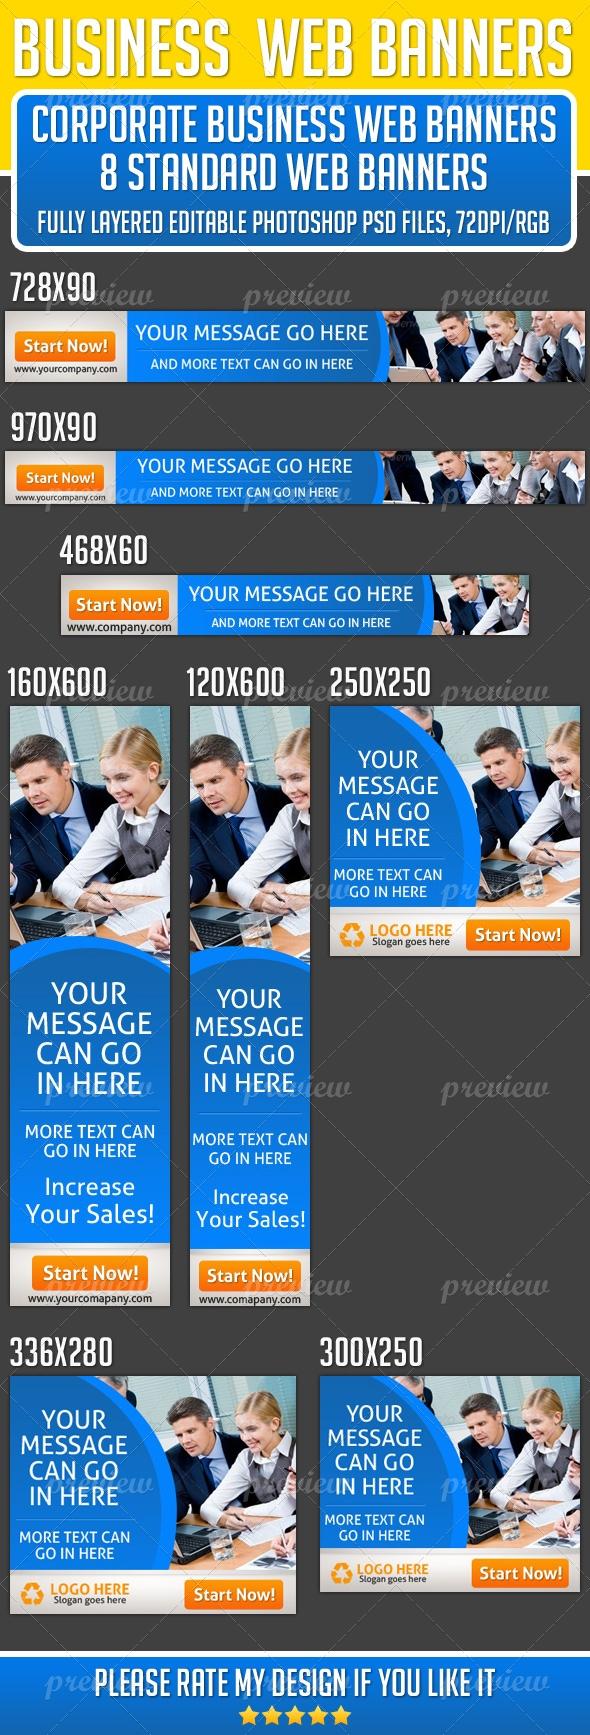 Corporate Business Web Banner Design